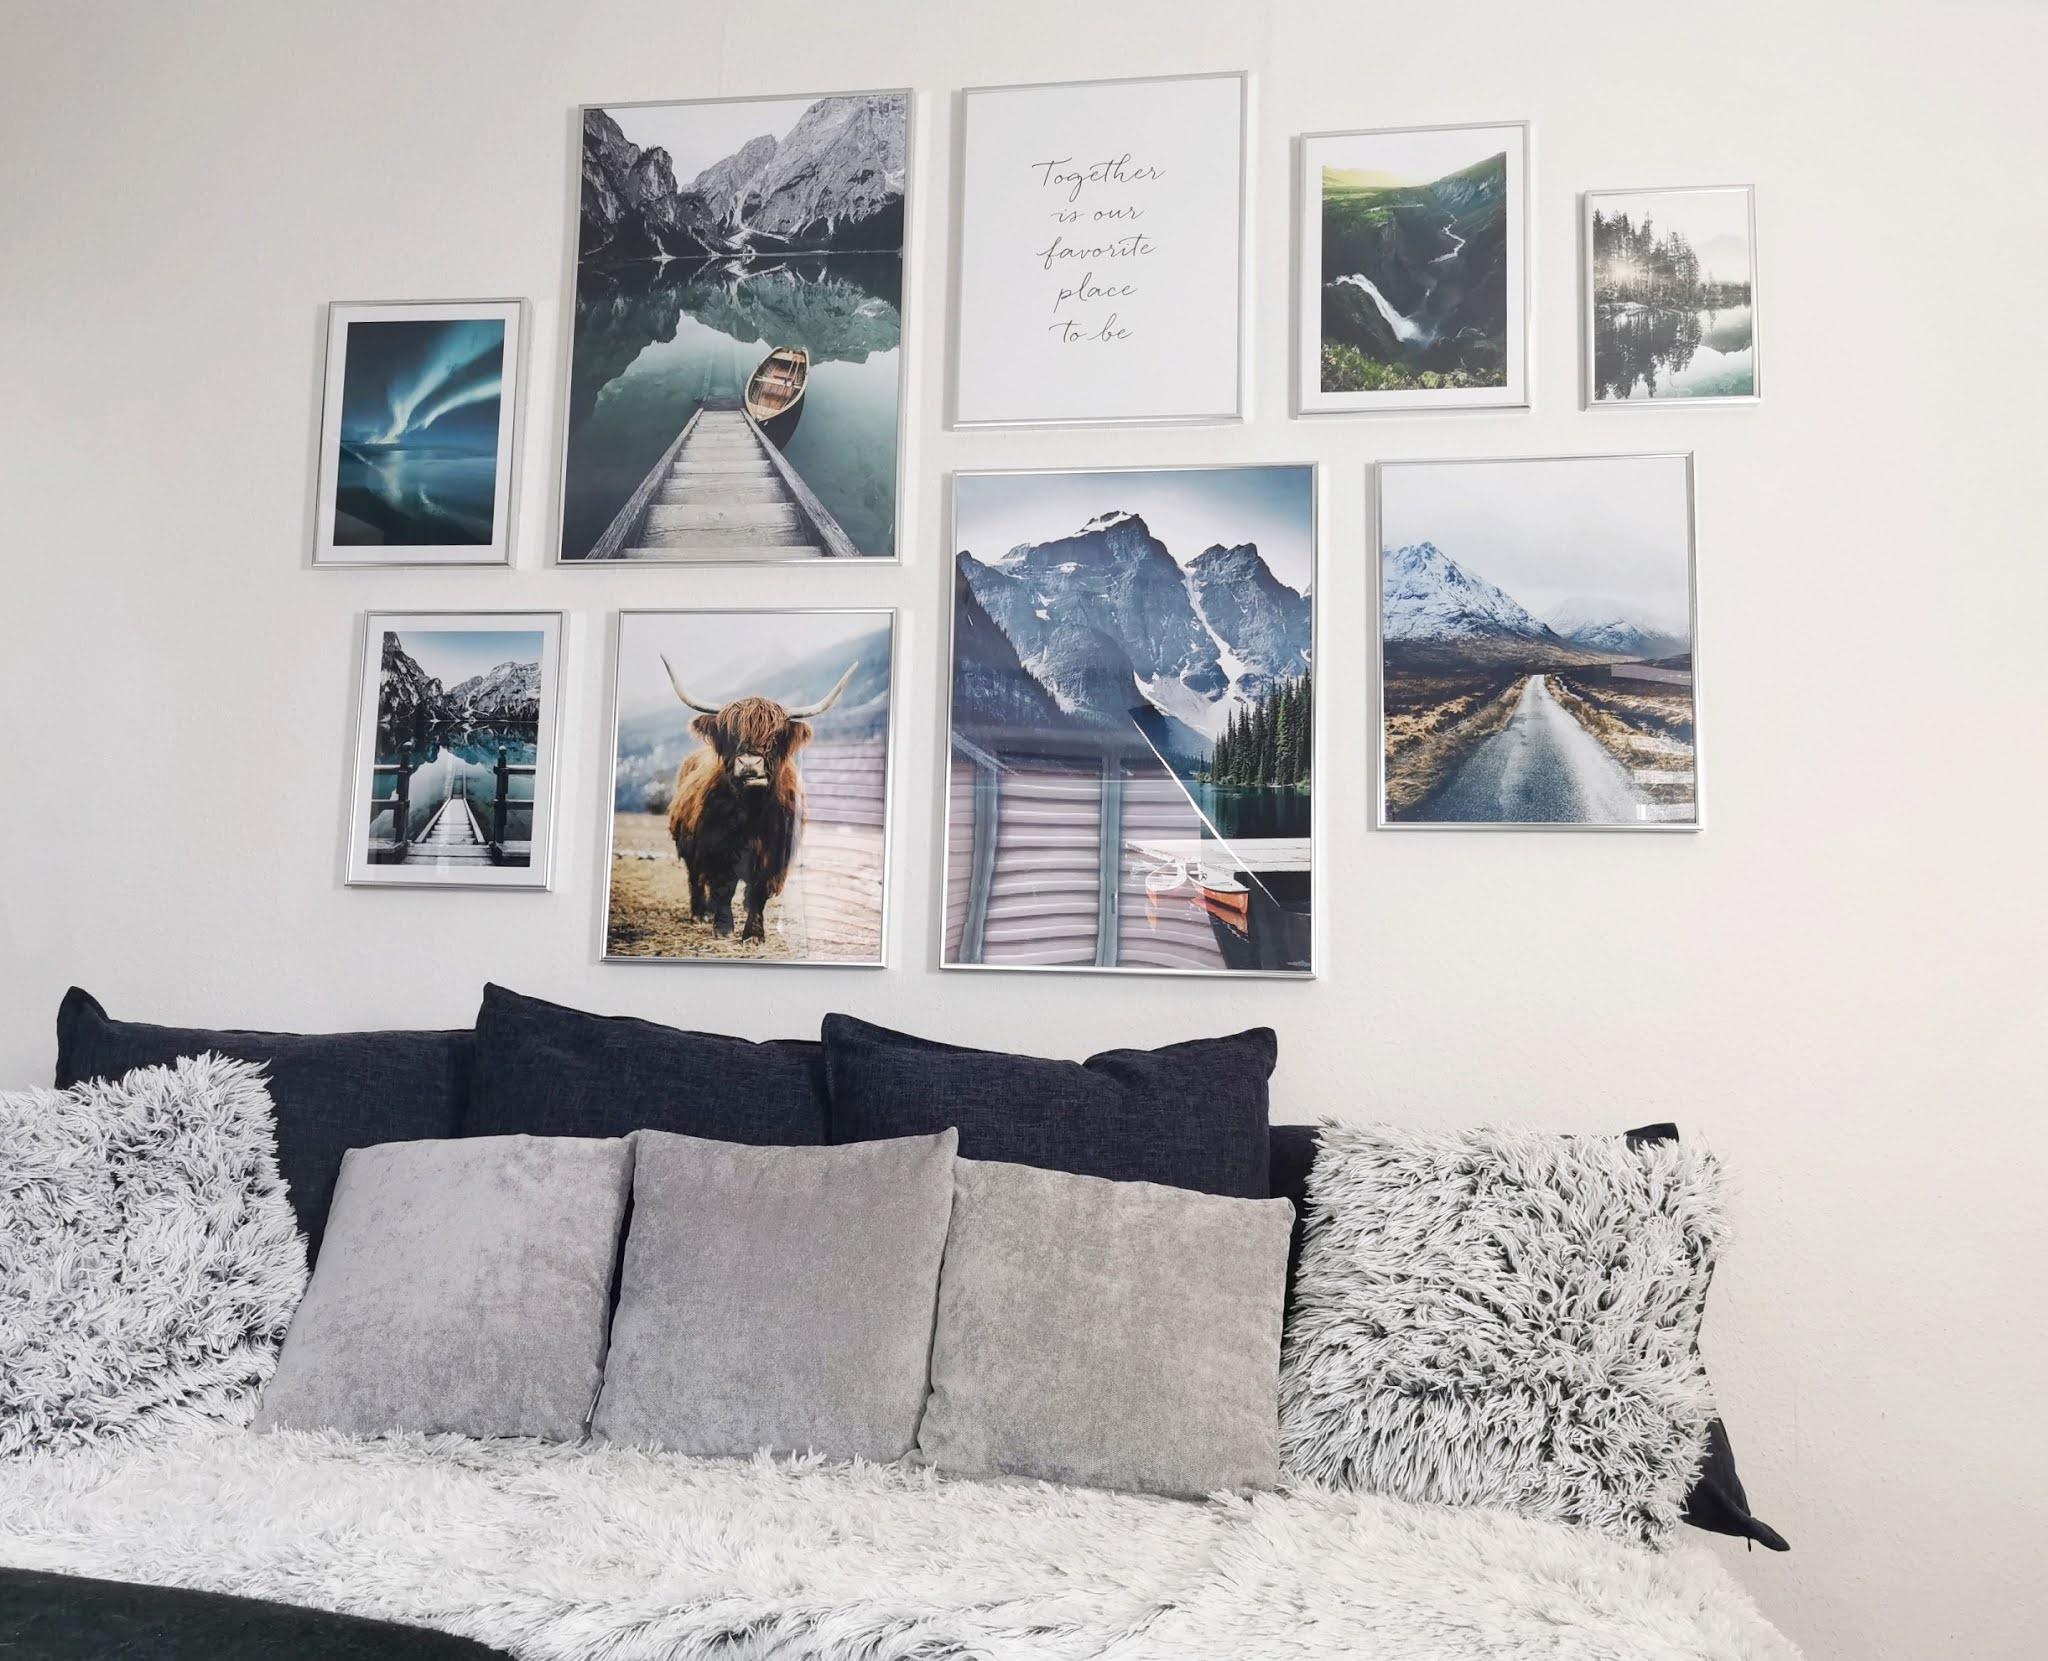 living,skandinavische bilderwand,wanddeko,posterstore.de,erfahrung,poster store,inspiration,rahmen,kunstdrucke,bilder,wandgestaltung,bilderrahmen,wandbilder,poster,